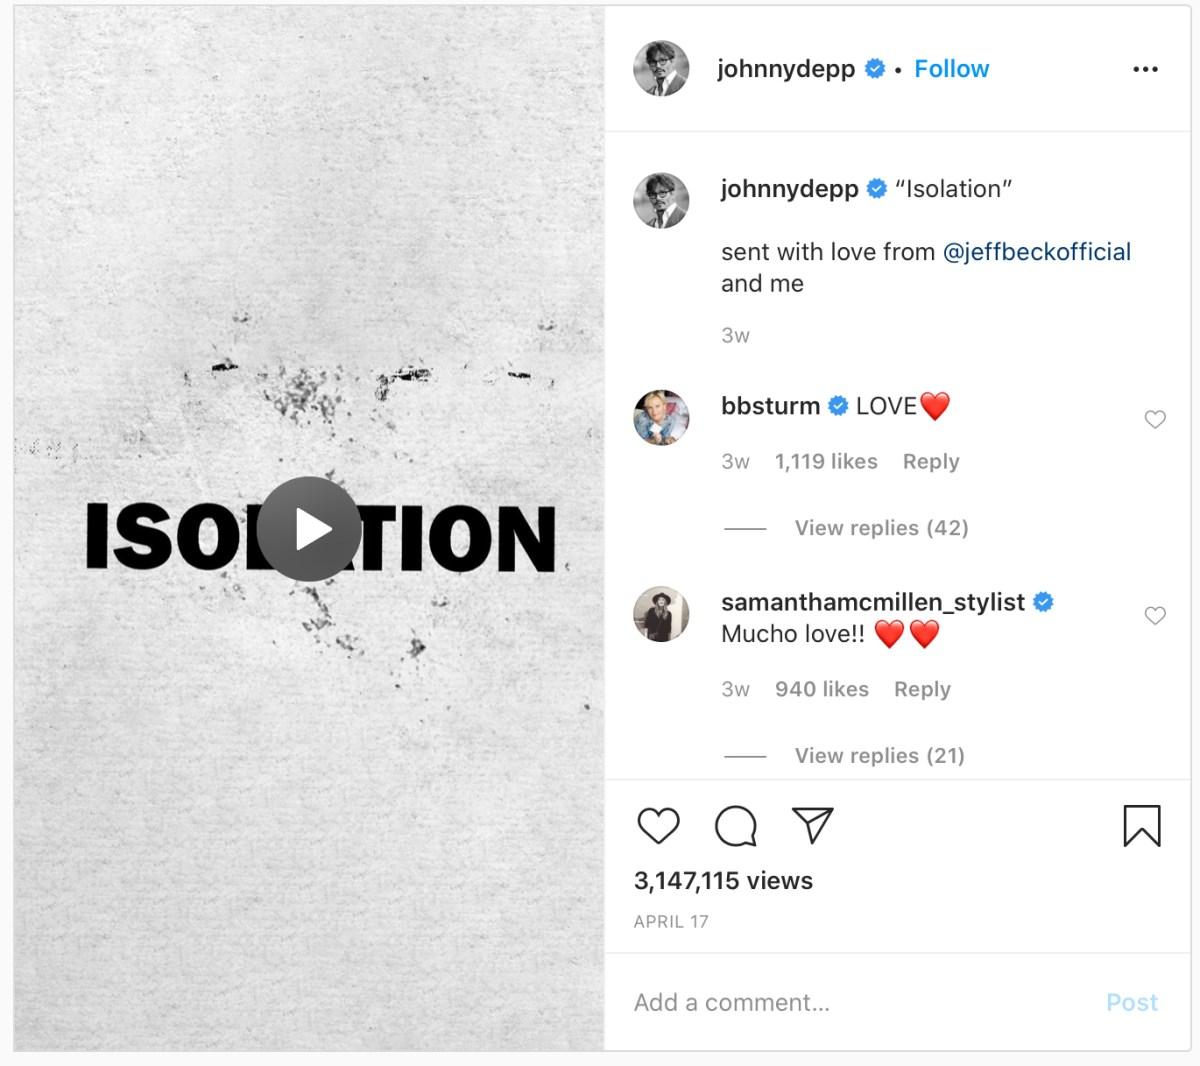 johnny-depp-jeff-beck-isolation